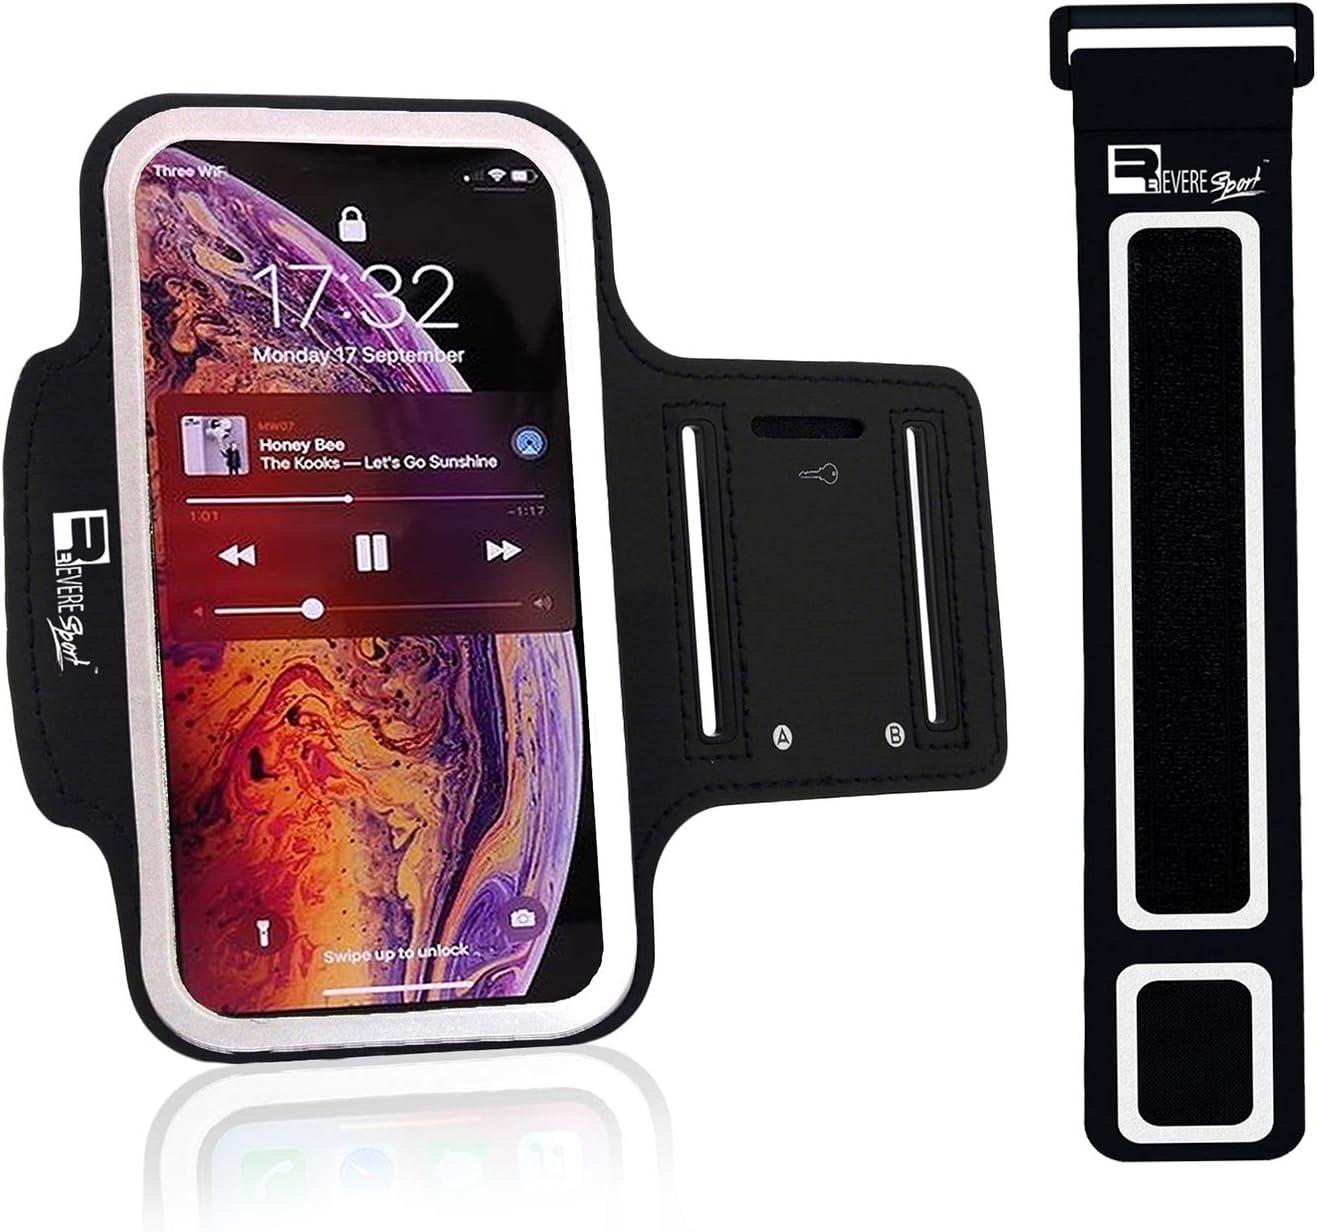 RevereSport Brazalete Deportivo iPhone 11/11 Pro MAX/XS MAX. Armband de Teléfono para Running, Jogging, Turismo, Ciclismo, Funda Caso de Ejercicio: Amazon.es: Electrónica